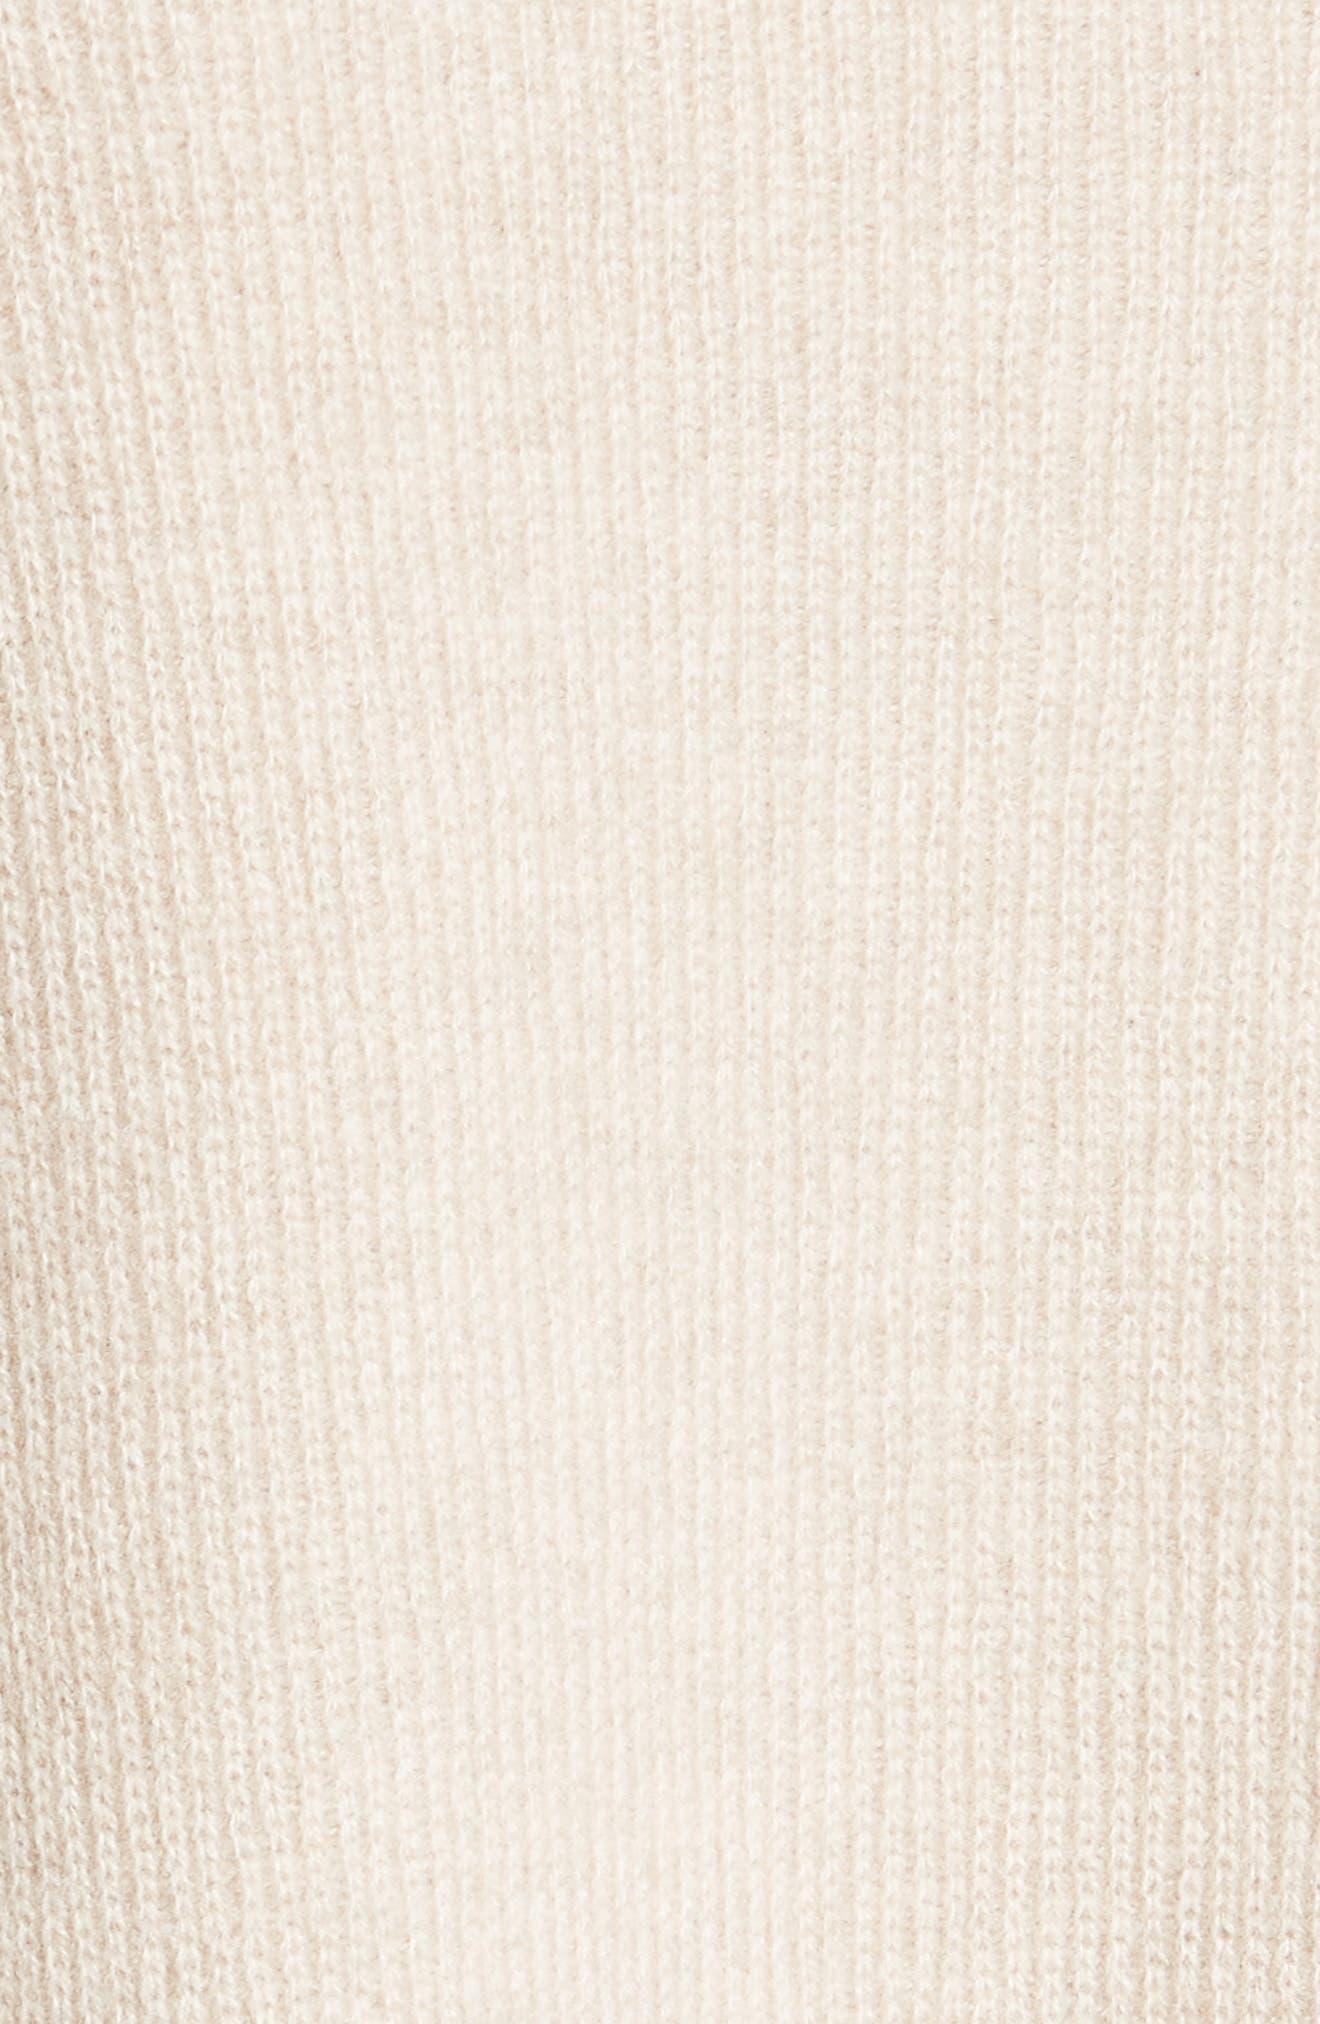 VINCE,                             Boxy Cashmere Sweater,                             Alternate thumbnail 5, color,                             233